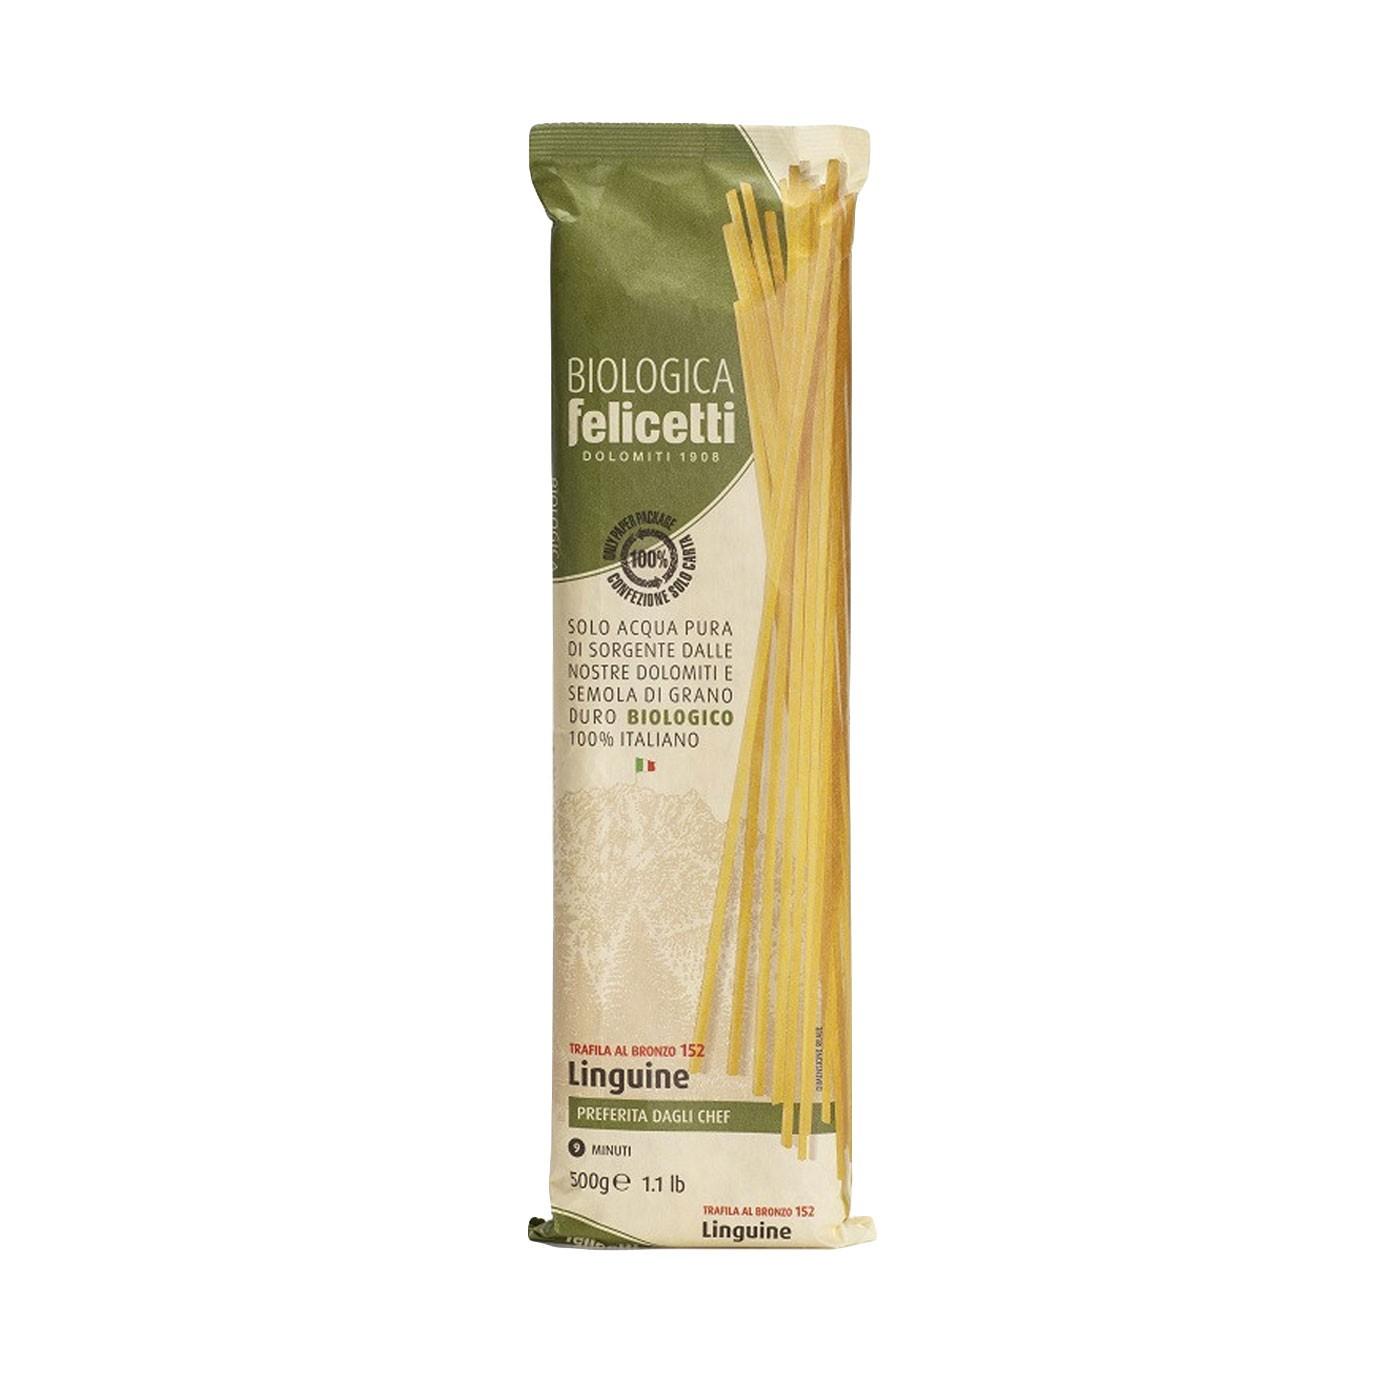 Organic Linguine 17.6 oz - Felicetti | Eataly.com